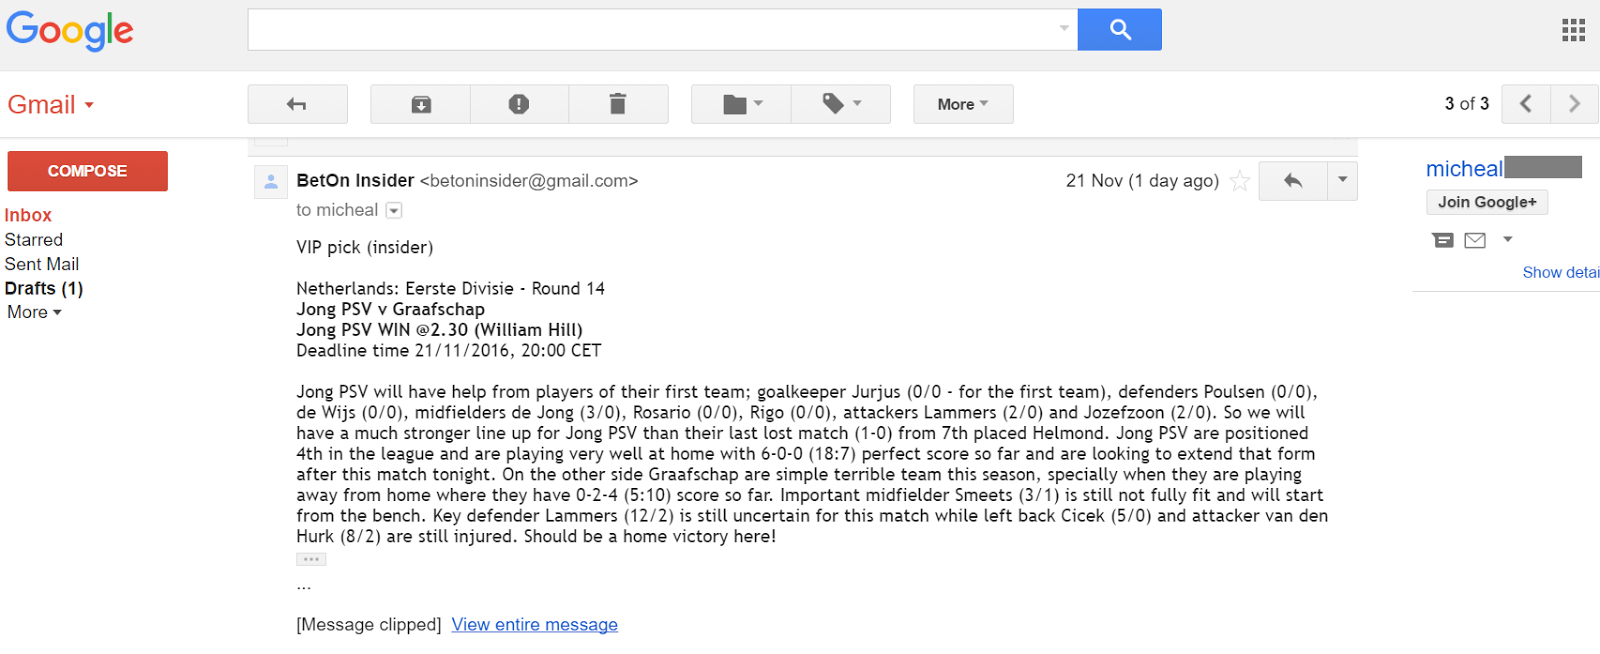 Google themes crvena zvezda - For More Information Regarding Vip Picks Email Via Betoninsider Gmail Com